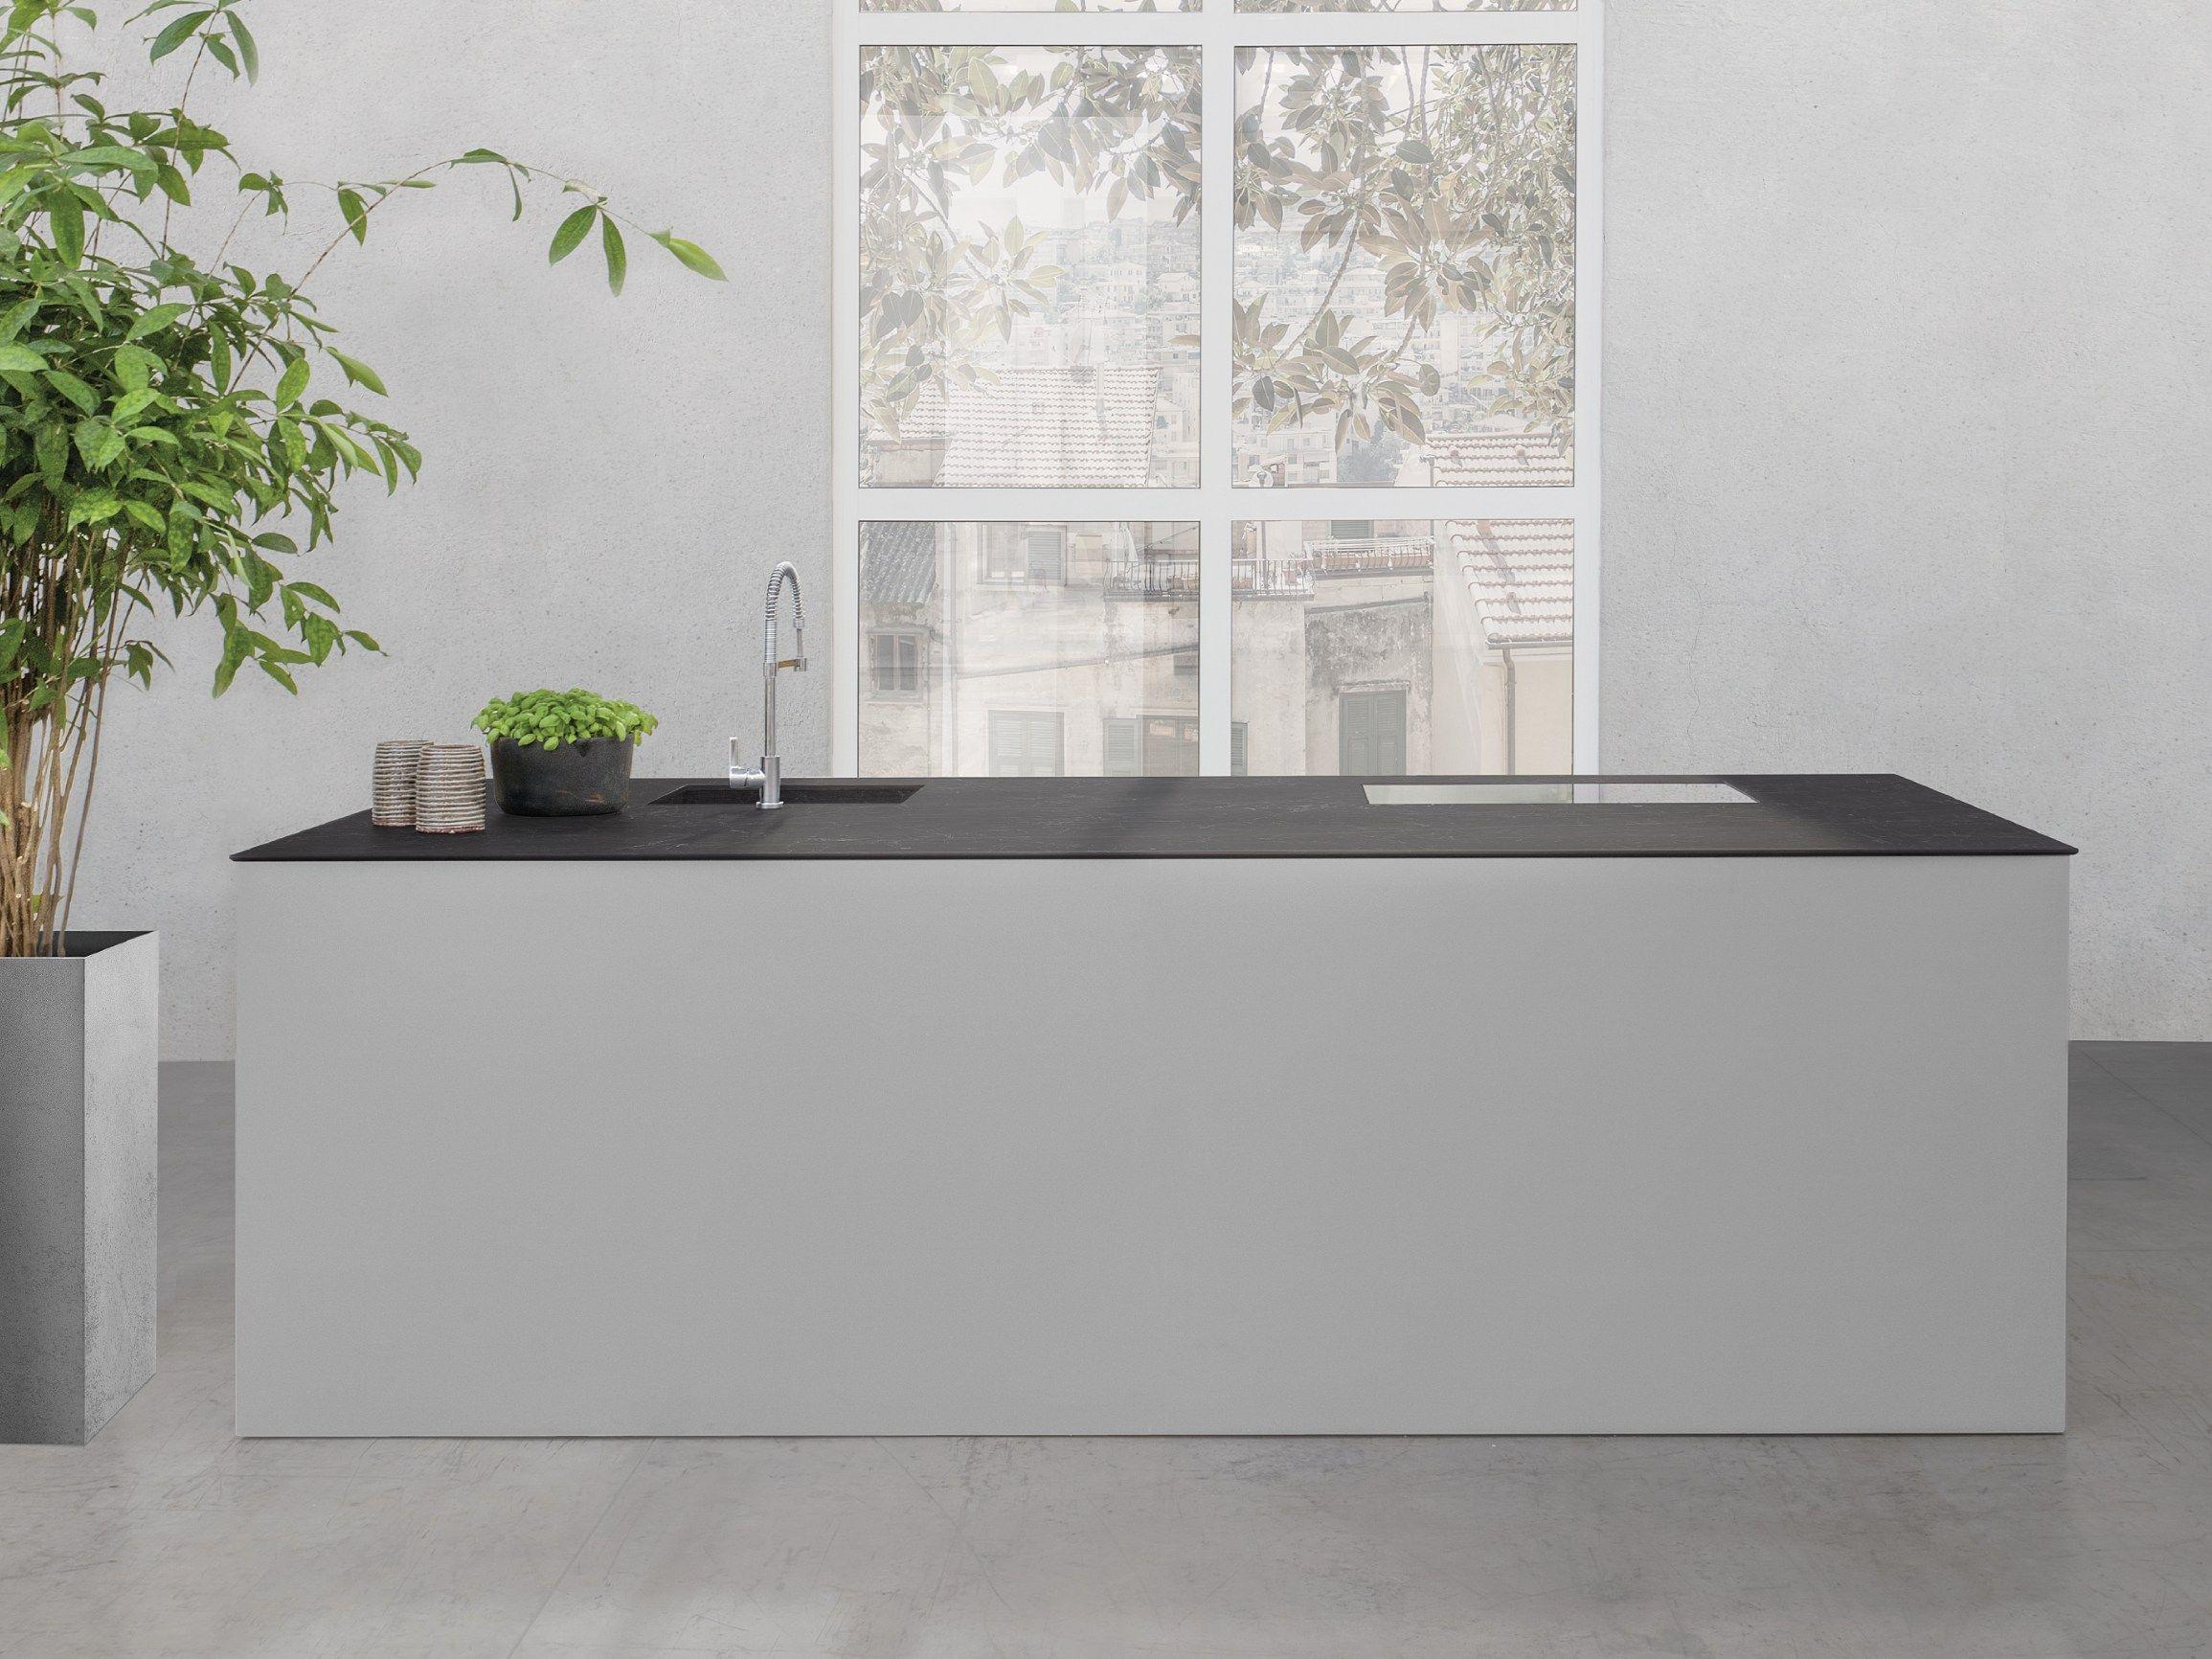 cava 1620x3240 collection 1620x3240mm by laminam design laminam. Black Bedroom Furniture Sets. Home Design Ideas